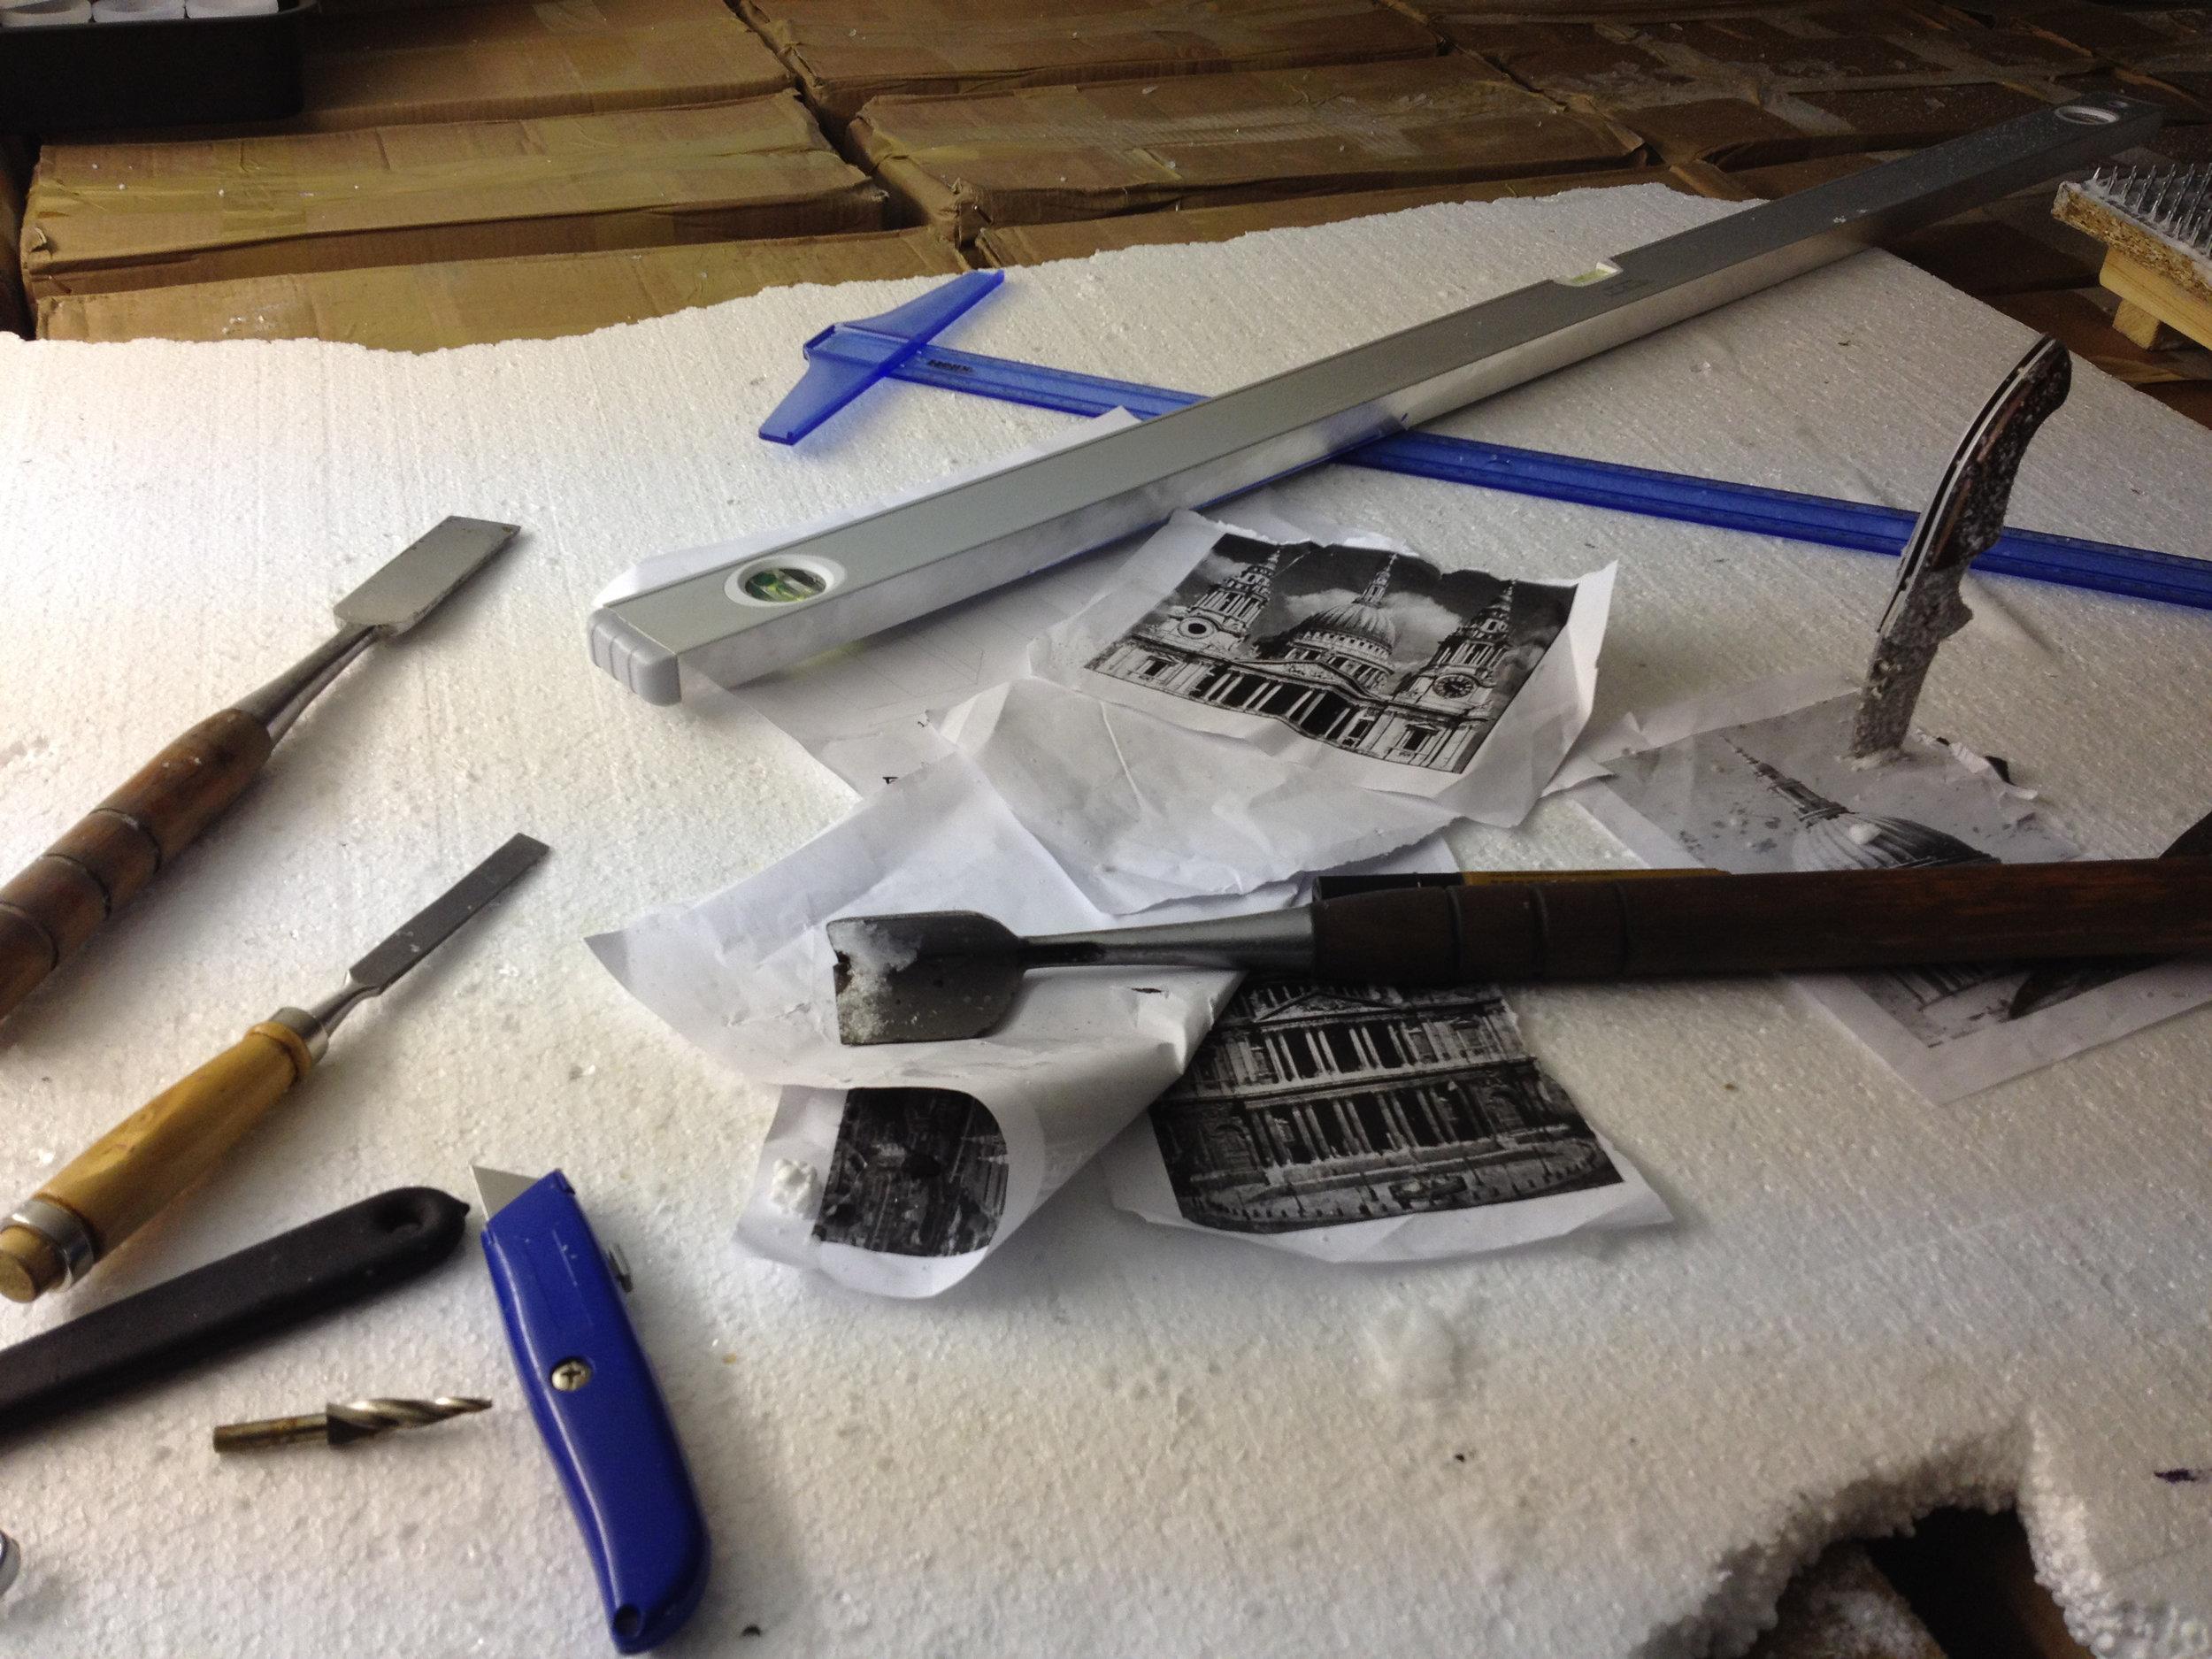 Preperation drawings & Tools